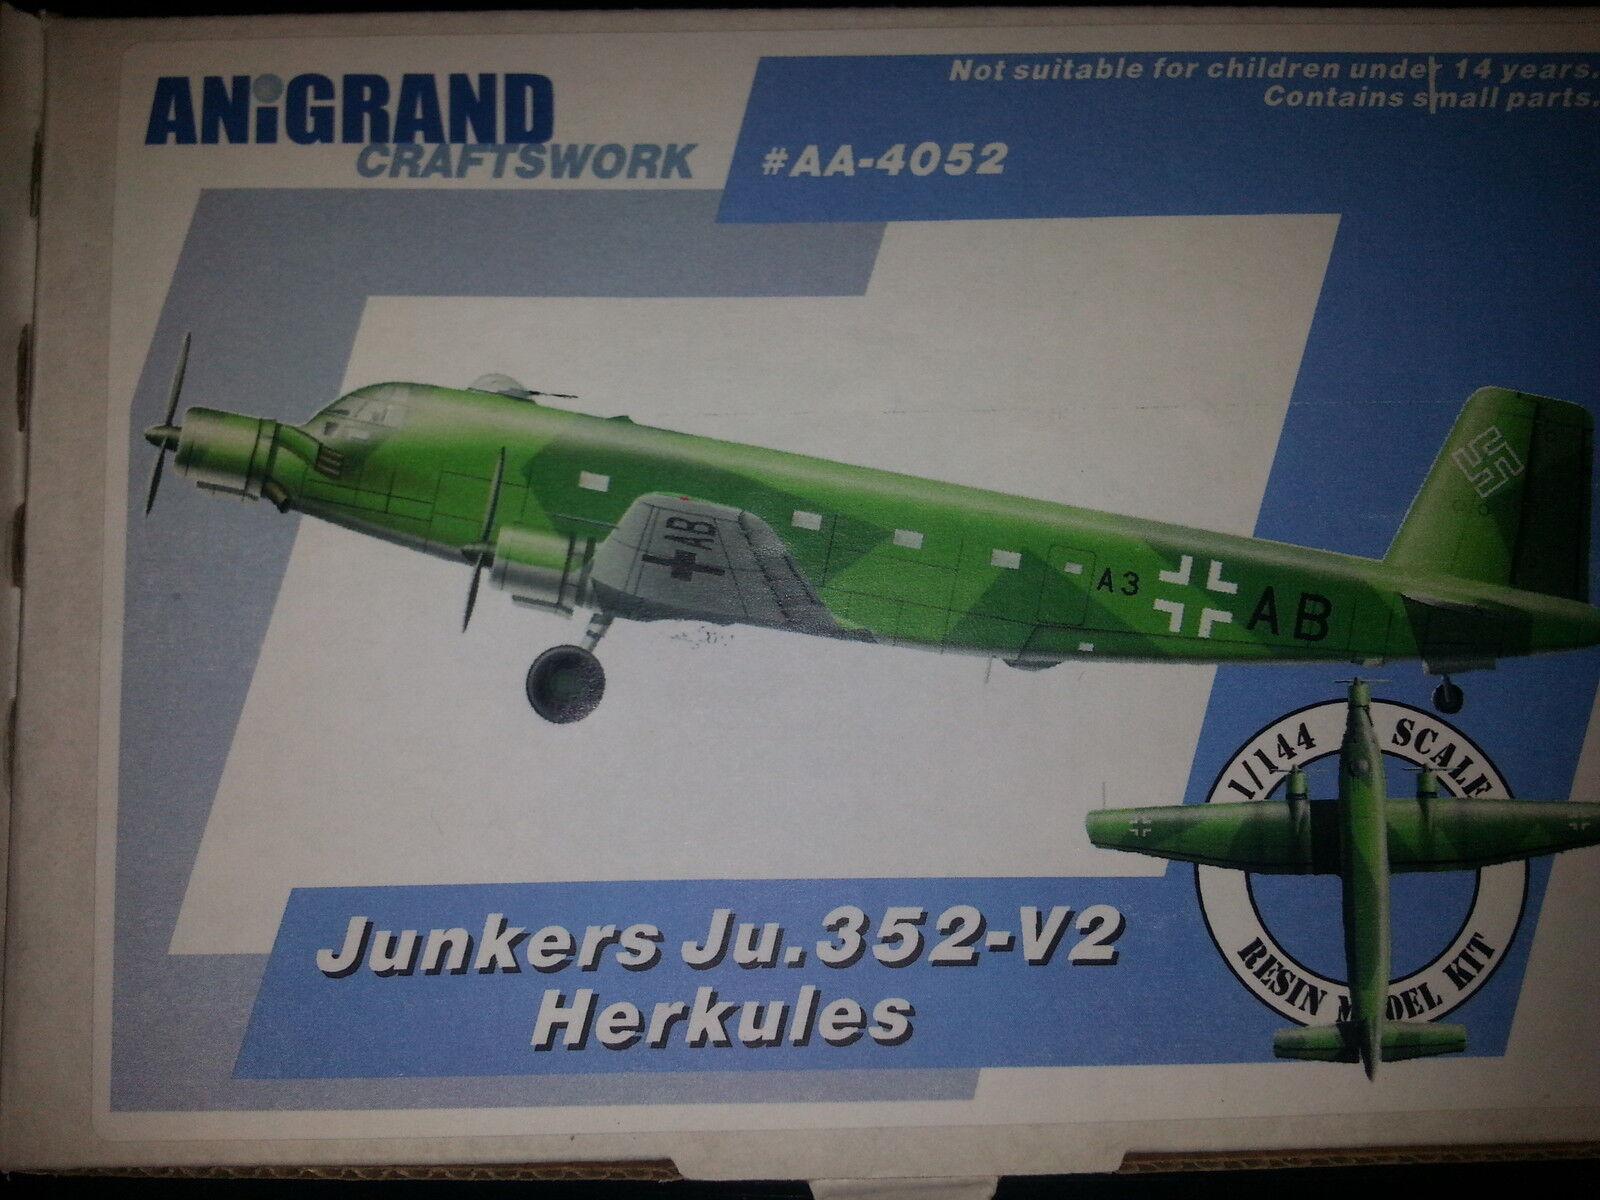 JUNKERS JU-352-V2 HERKULES (+ 4 Kits) ANIGRAND 1 144 RESIN KIT